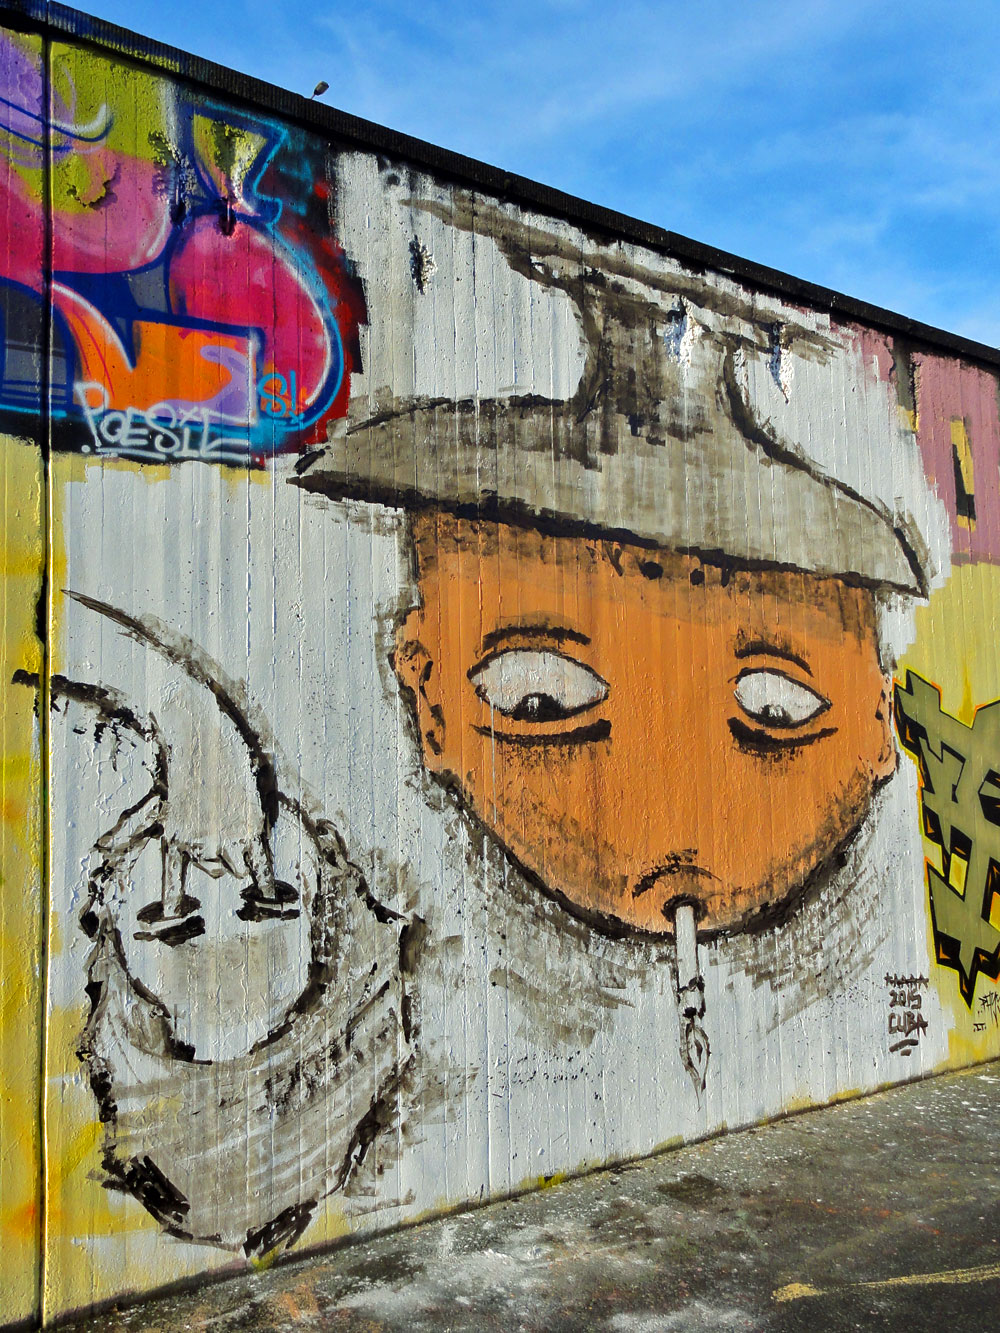 5stars-graffiti-hall-of-fame-frankfurt-ratsweg-unterfuehrung-1